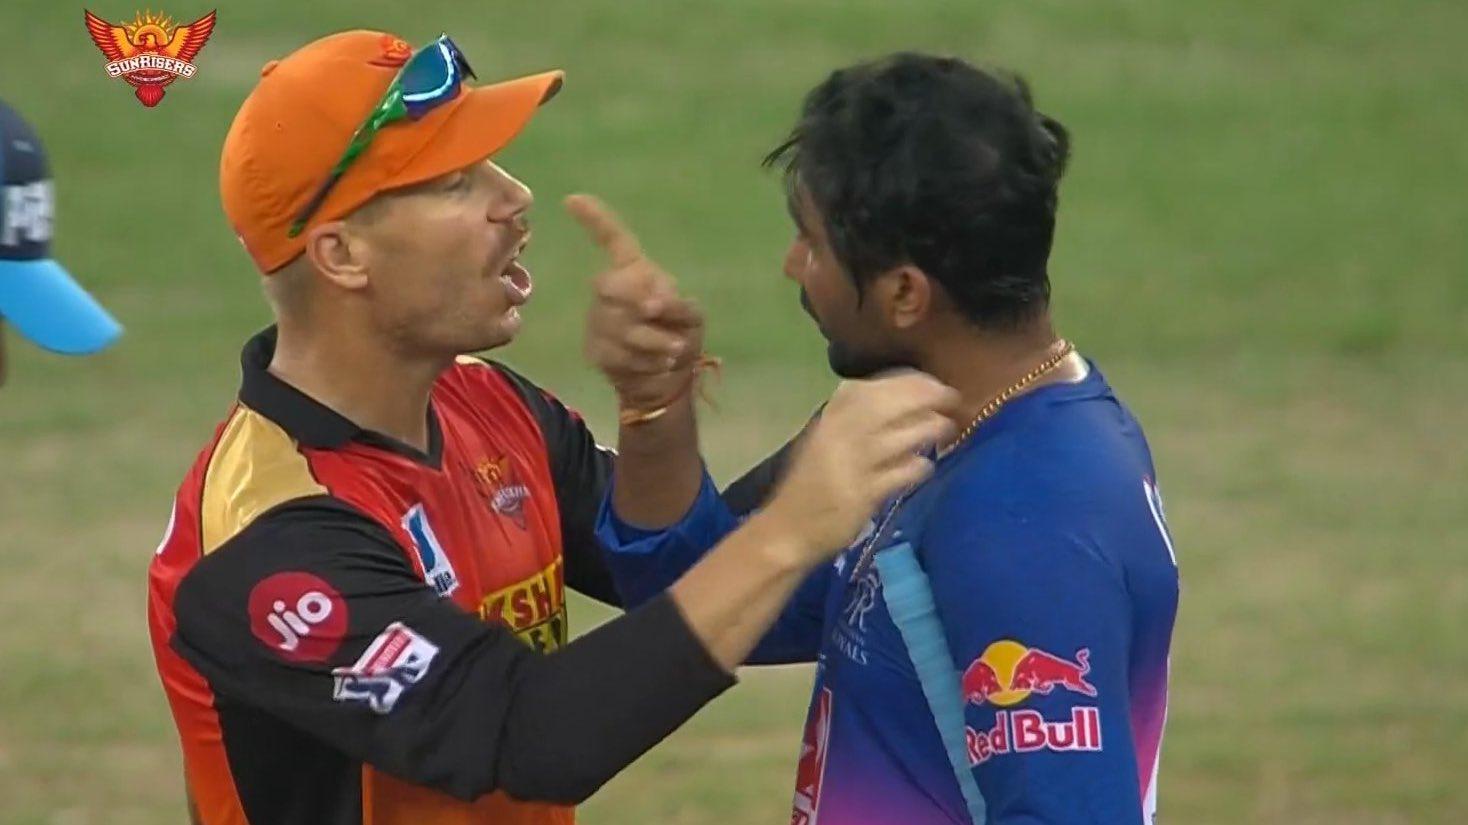 Rahul tewatia fighting with David Warner meme template